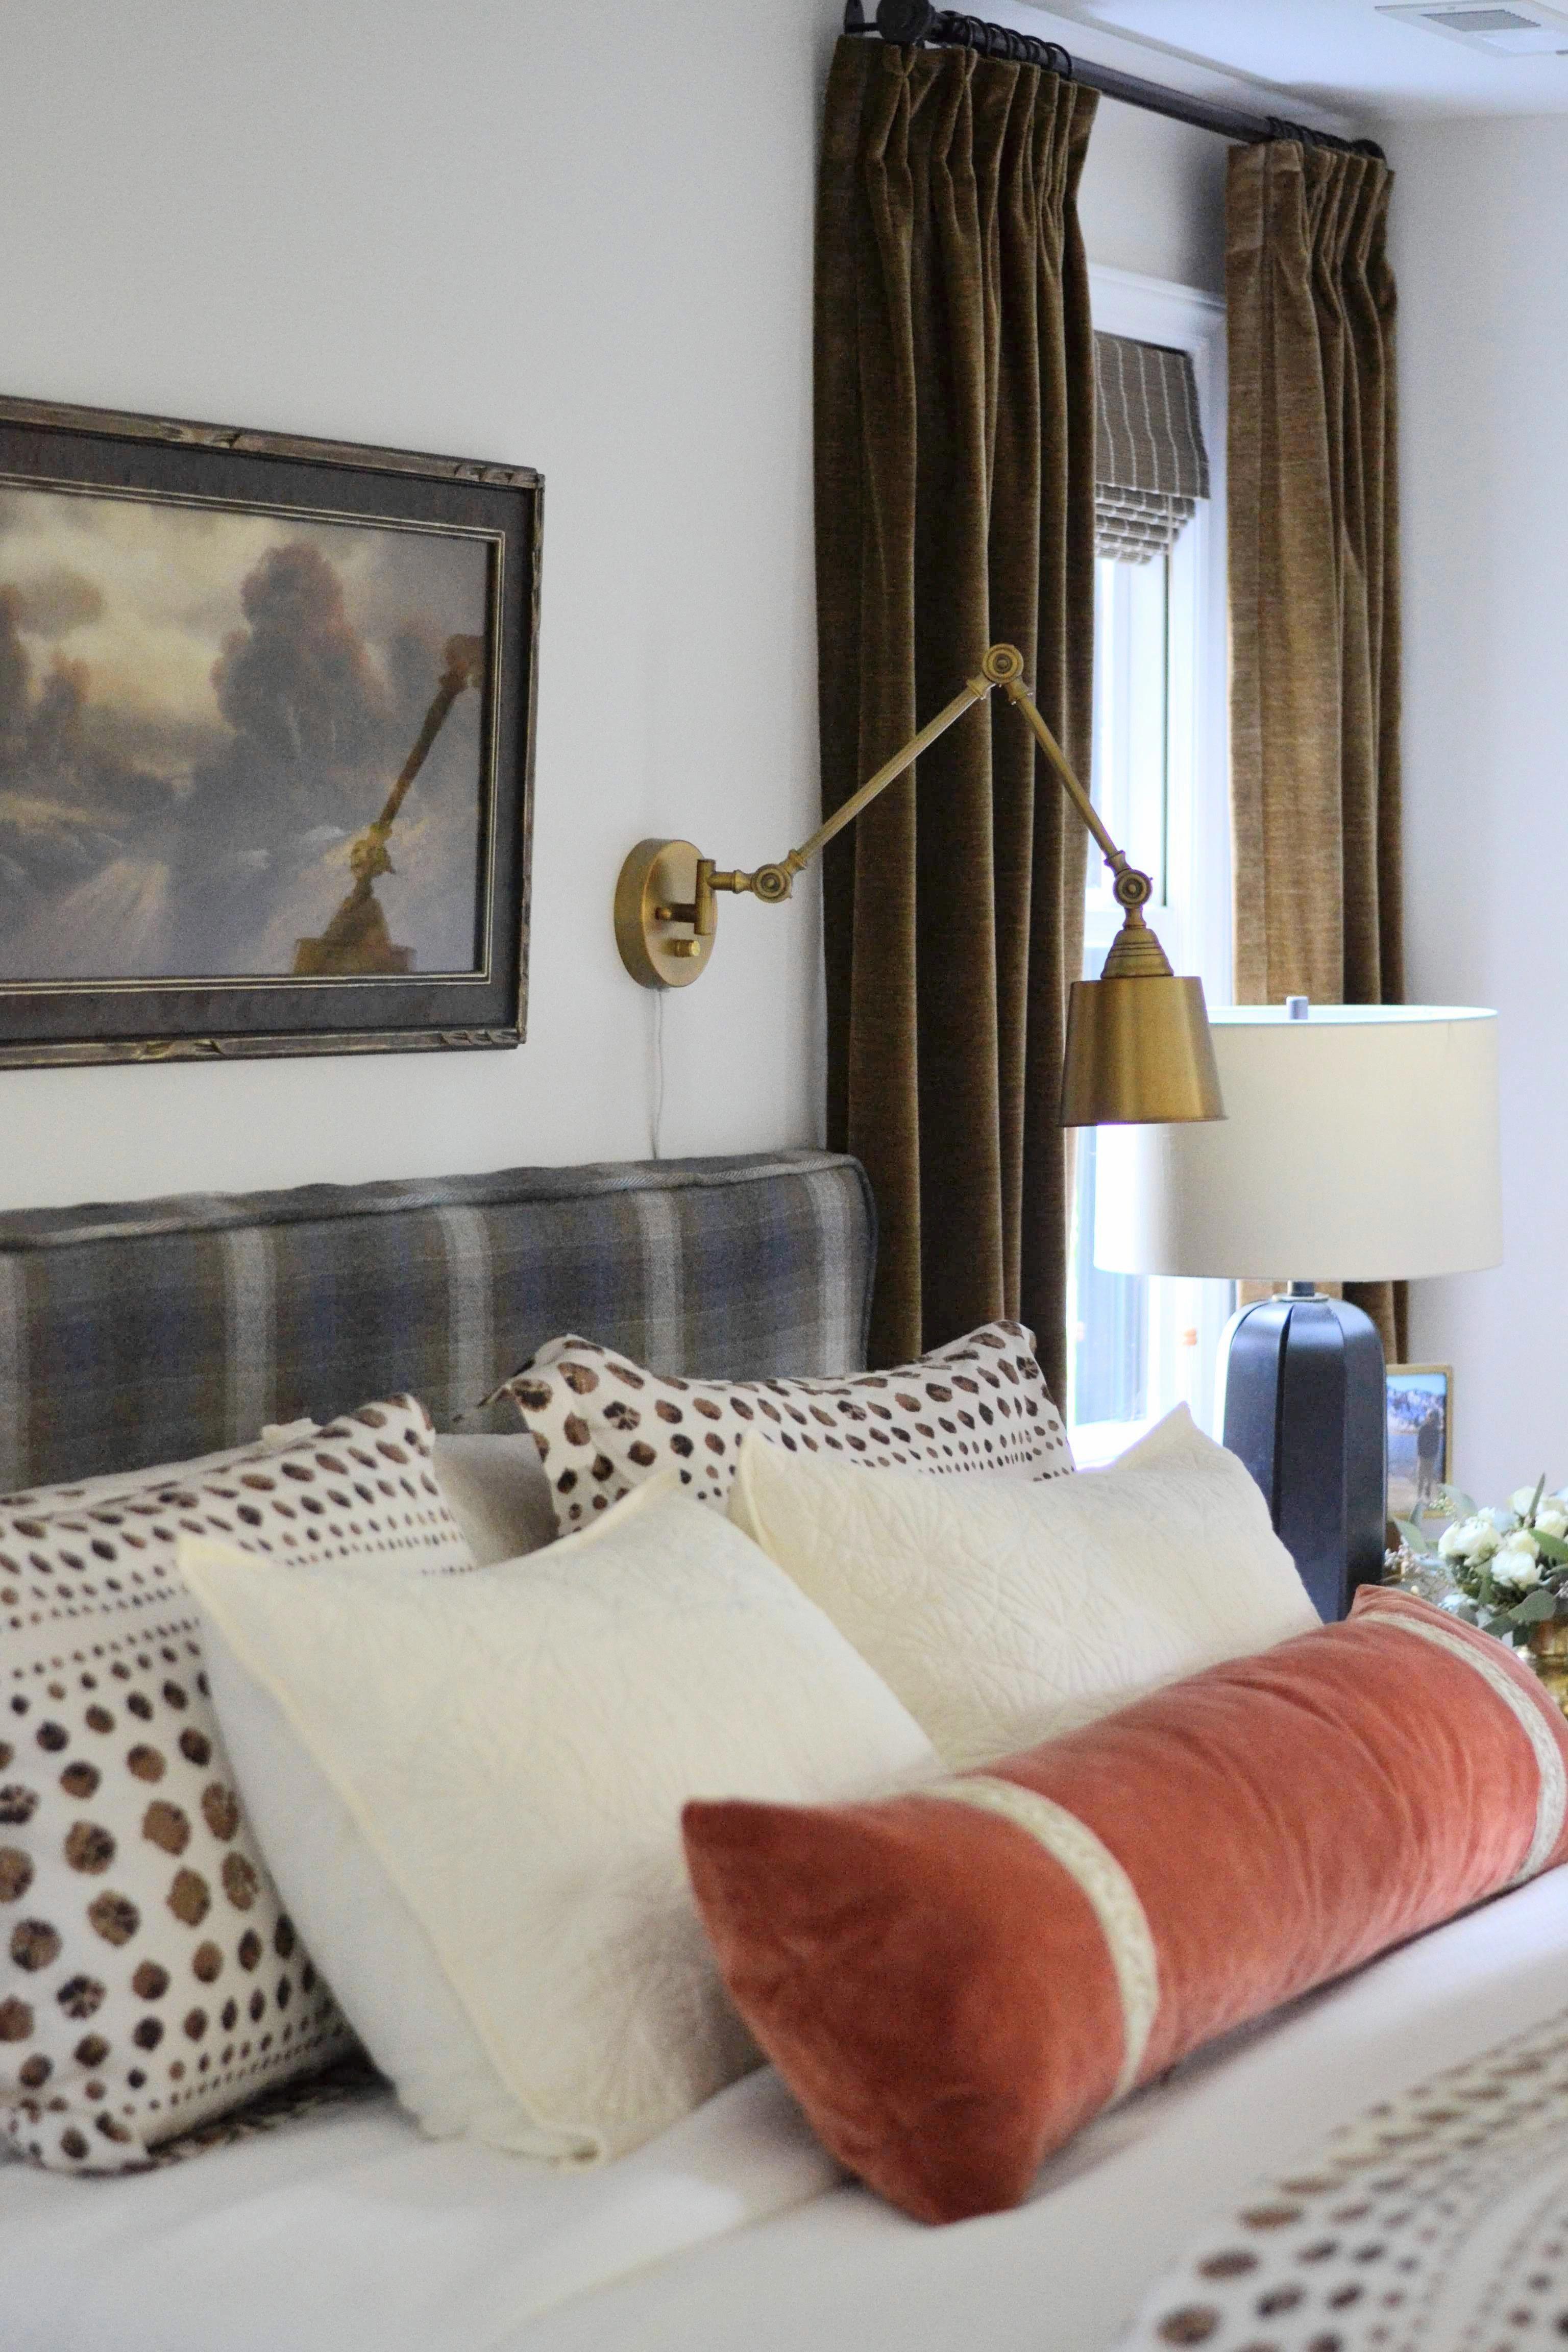 Kravet Toboggan Blue Jay, plaid headboard, Cate Holcombe Interiors #homedecorinspo